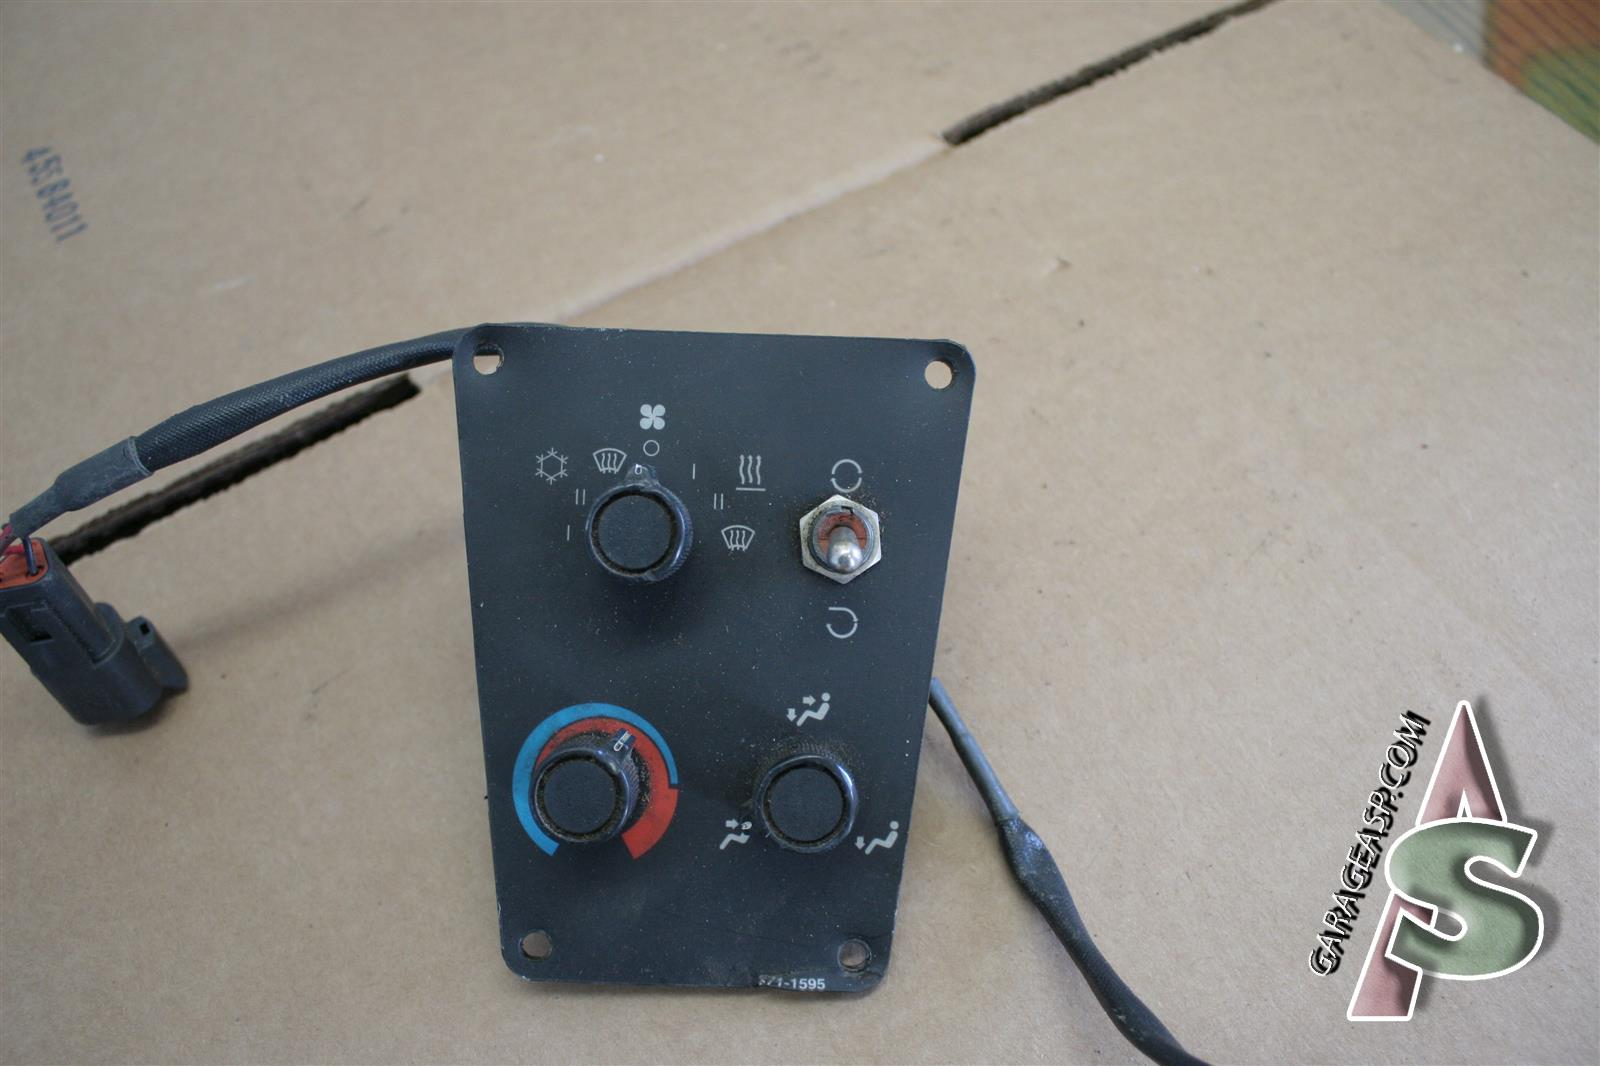 Caterpillar Electric Parts - Heavy equipment parts